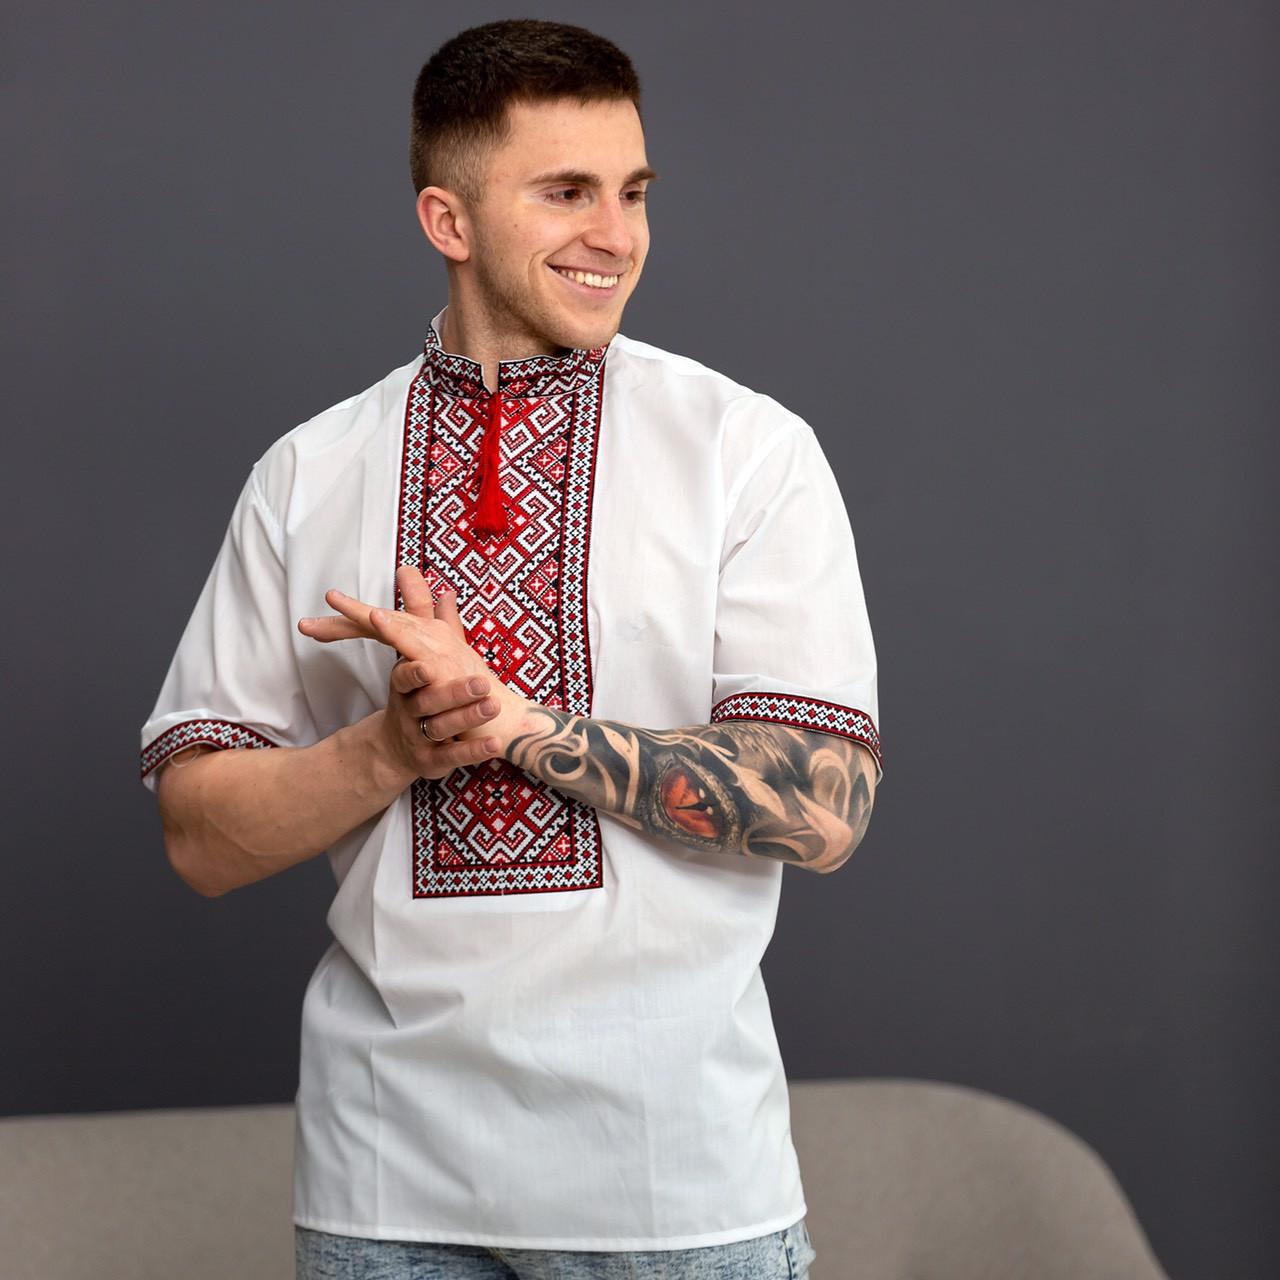 Вышиванка мужская короткий рукав - катон